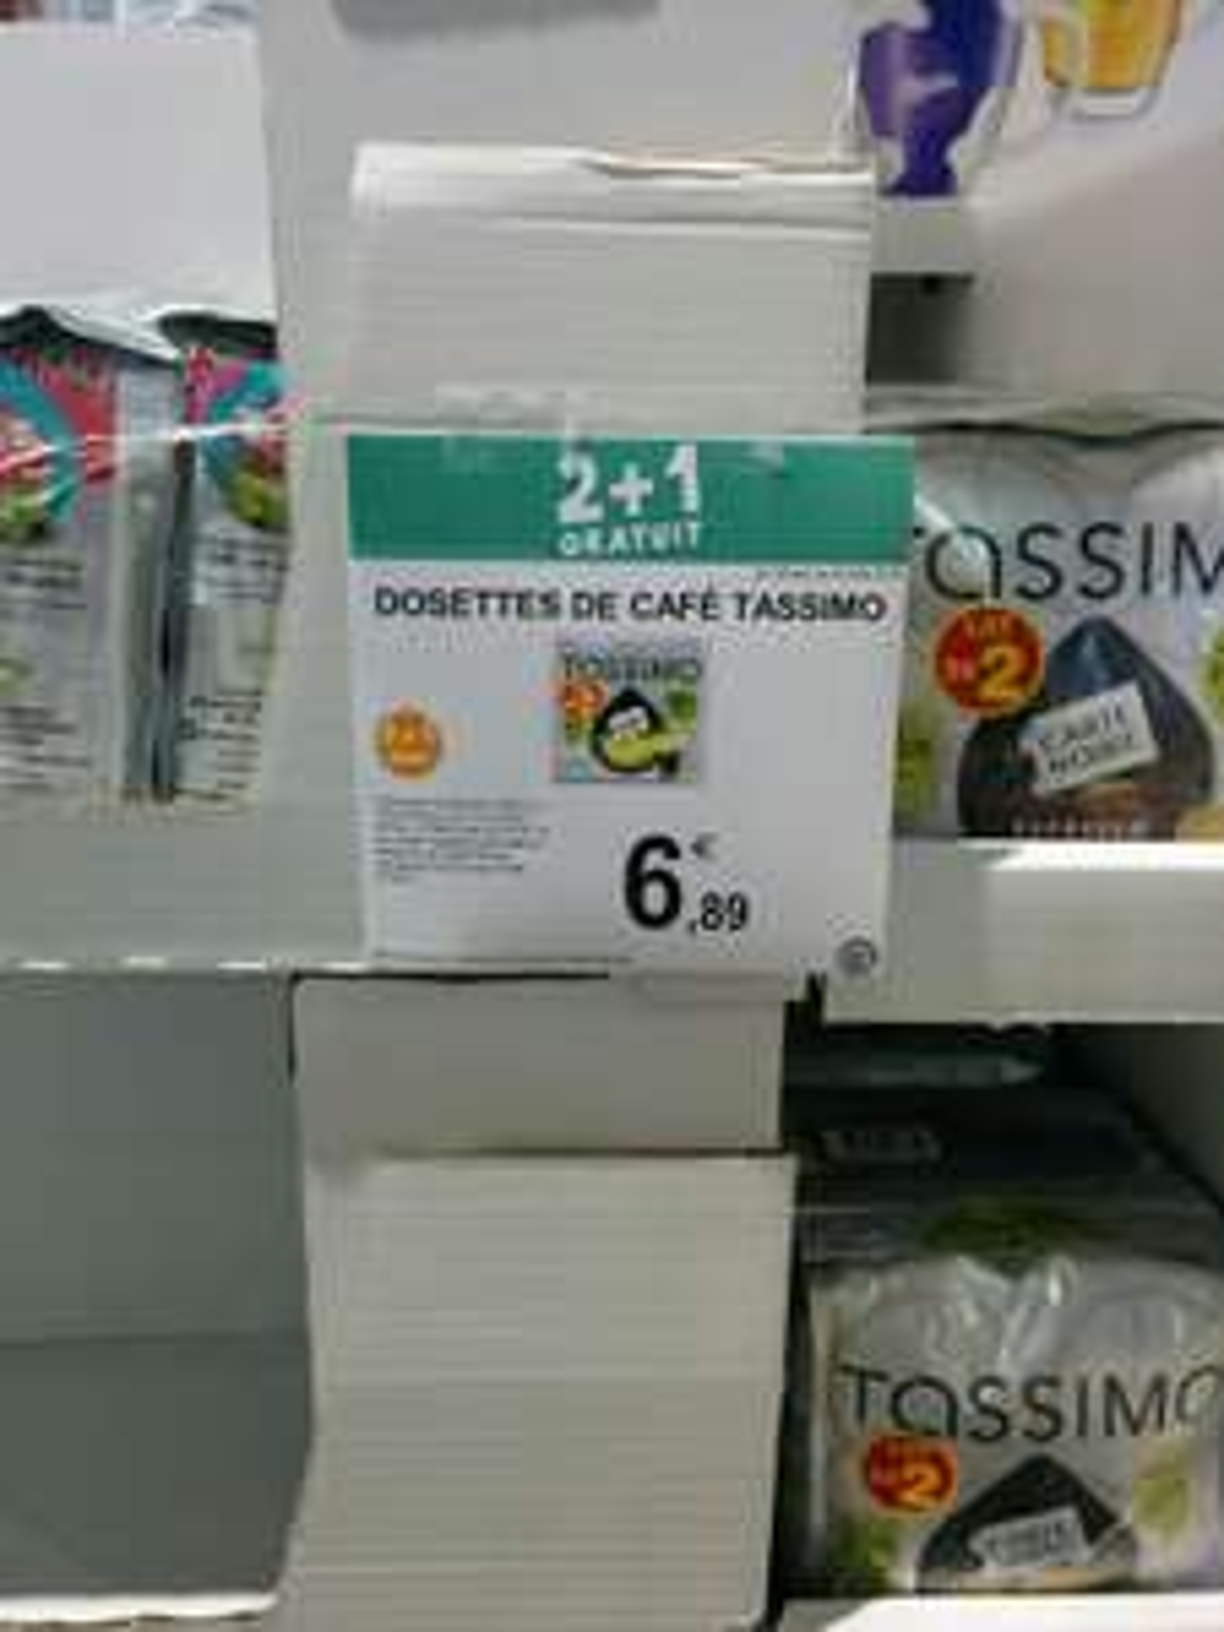 6 Packs de 16 Dosettes Tassimo - 6x16 dosettes